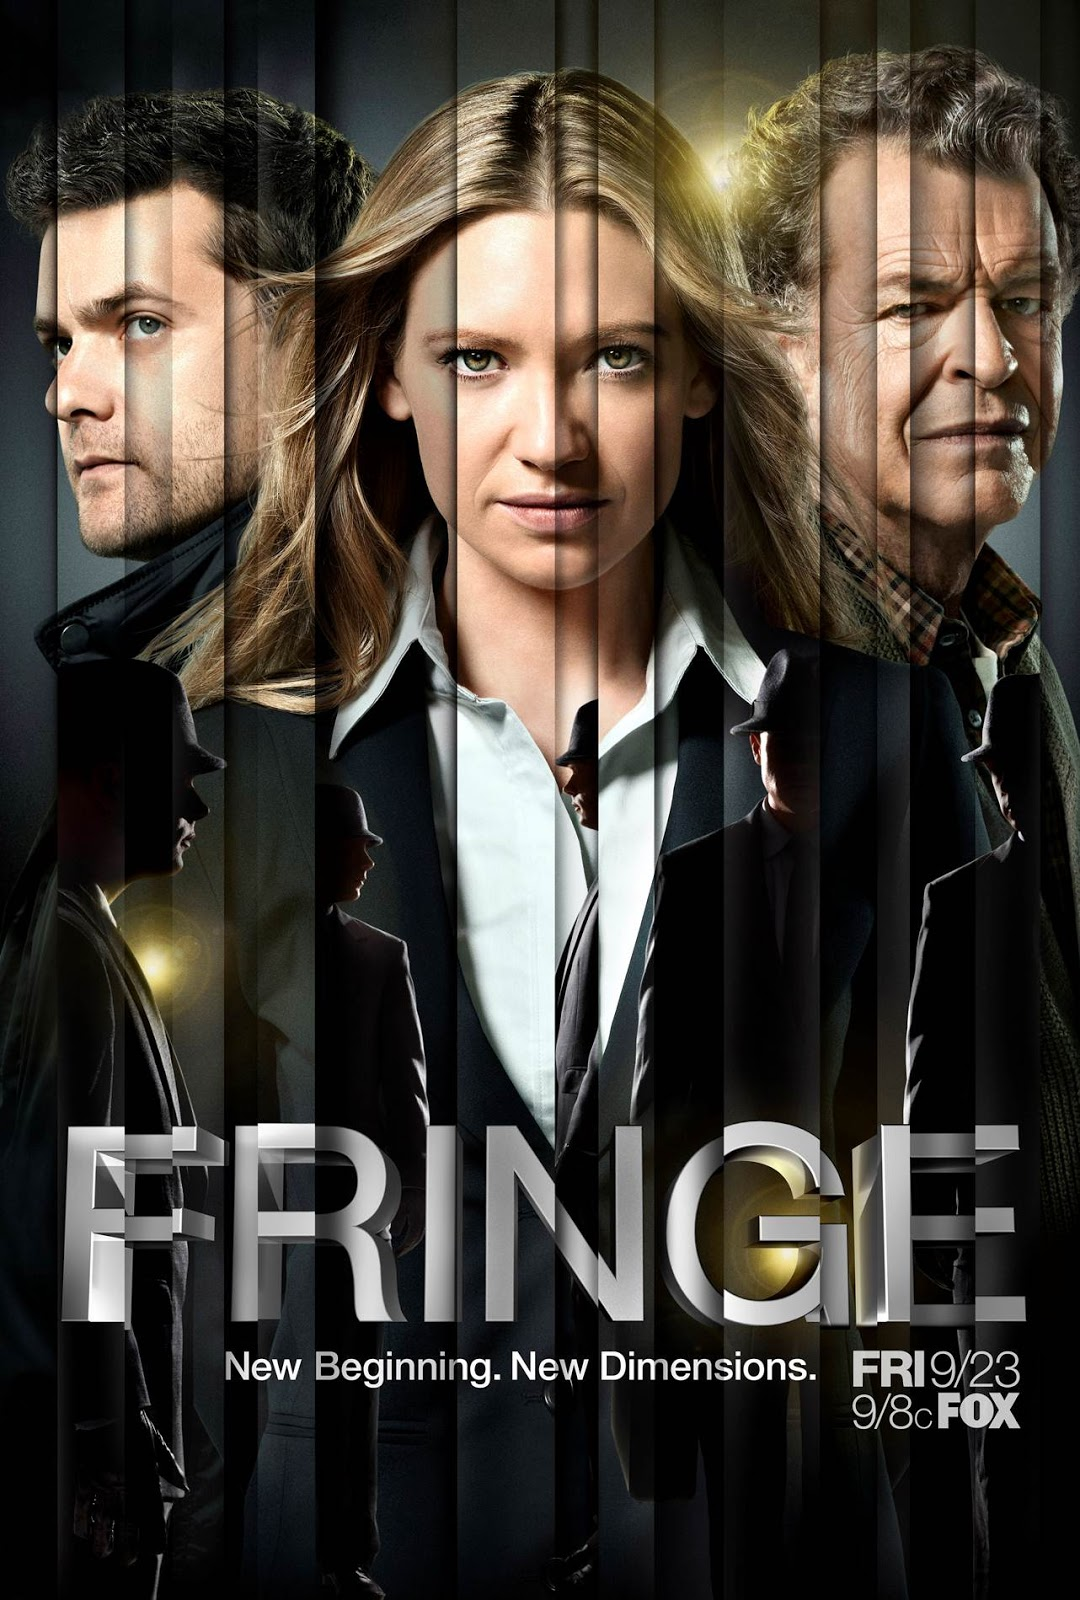 fox fringe tv showFringe Television   Fan Site for the FOX TV Series Fringe XQUxGw2J